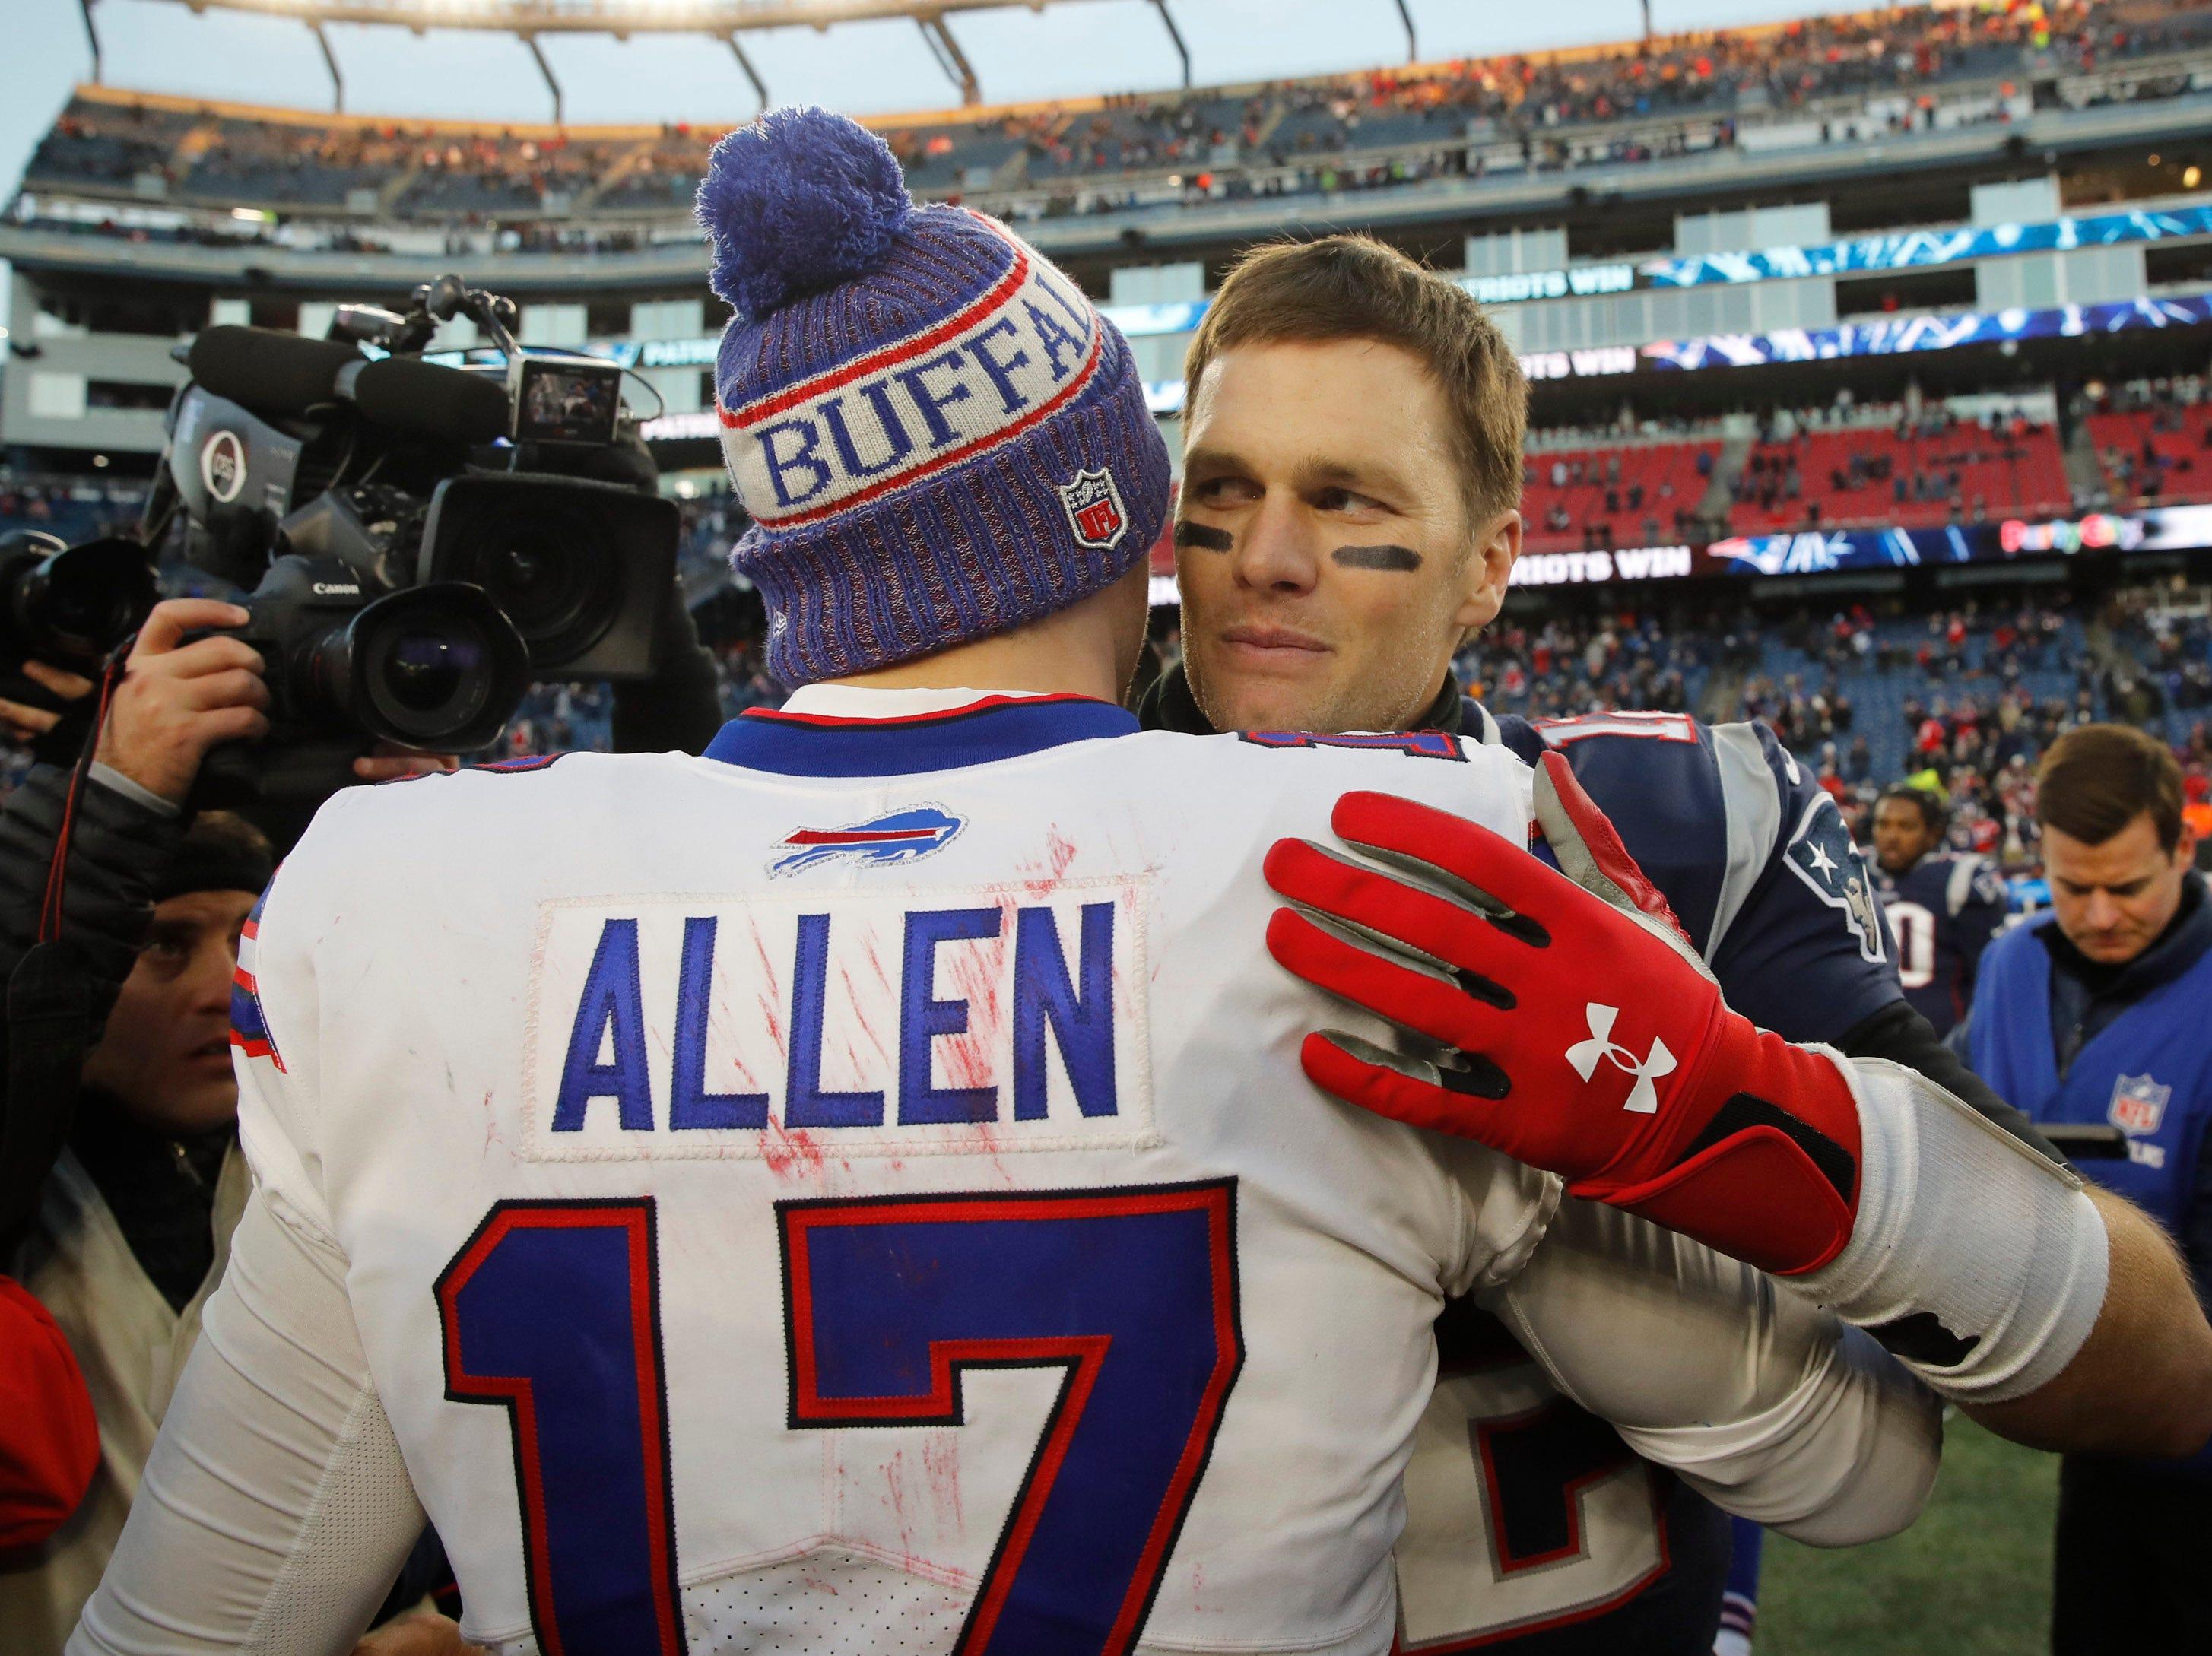 Dec 23, 2018; Foxborough, MA, USA; New England Patriots quarterback Tom Brady (12) meets Buffalo Bills quarterback Josh Allen (17) after the game at Gillette Stadium. Patriots defeated the Bills 24-12. Mandatory Credit: David Butler II-USA TODAY Sports